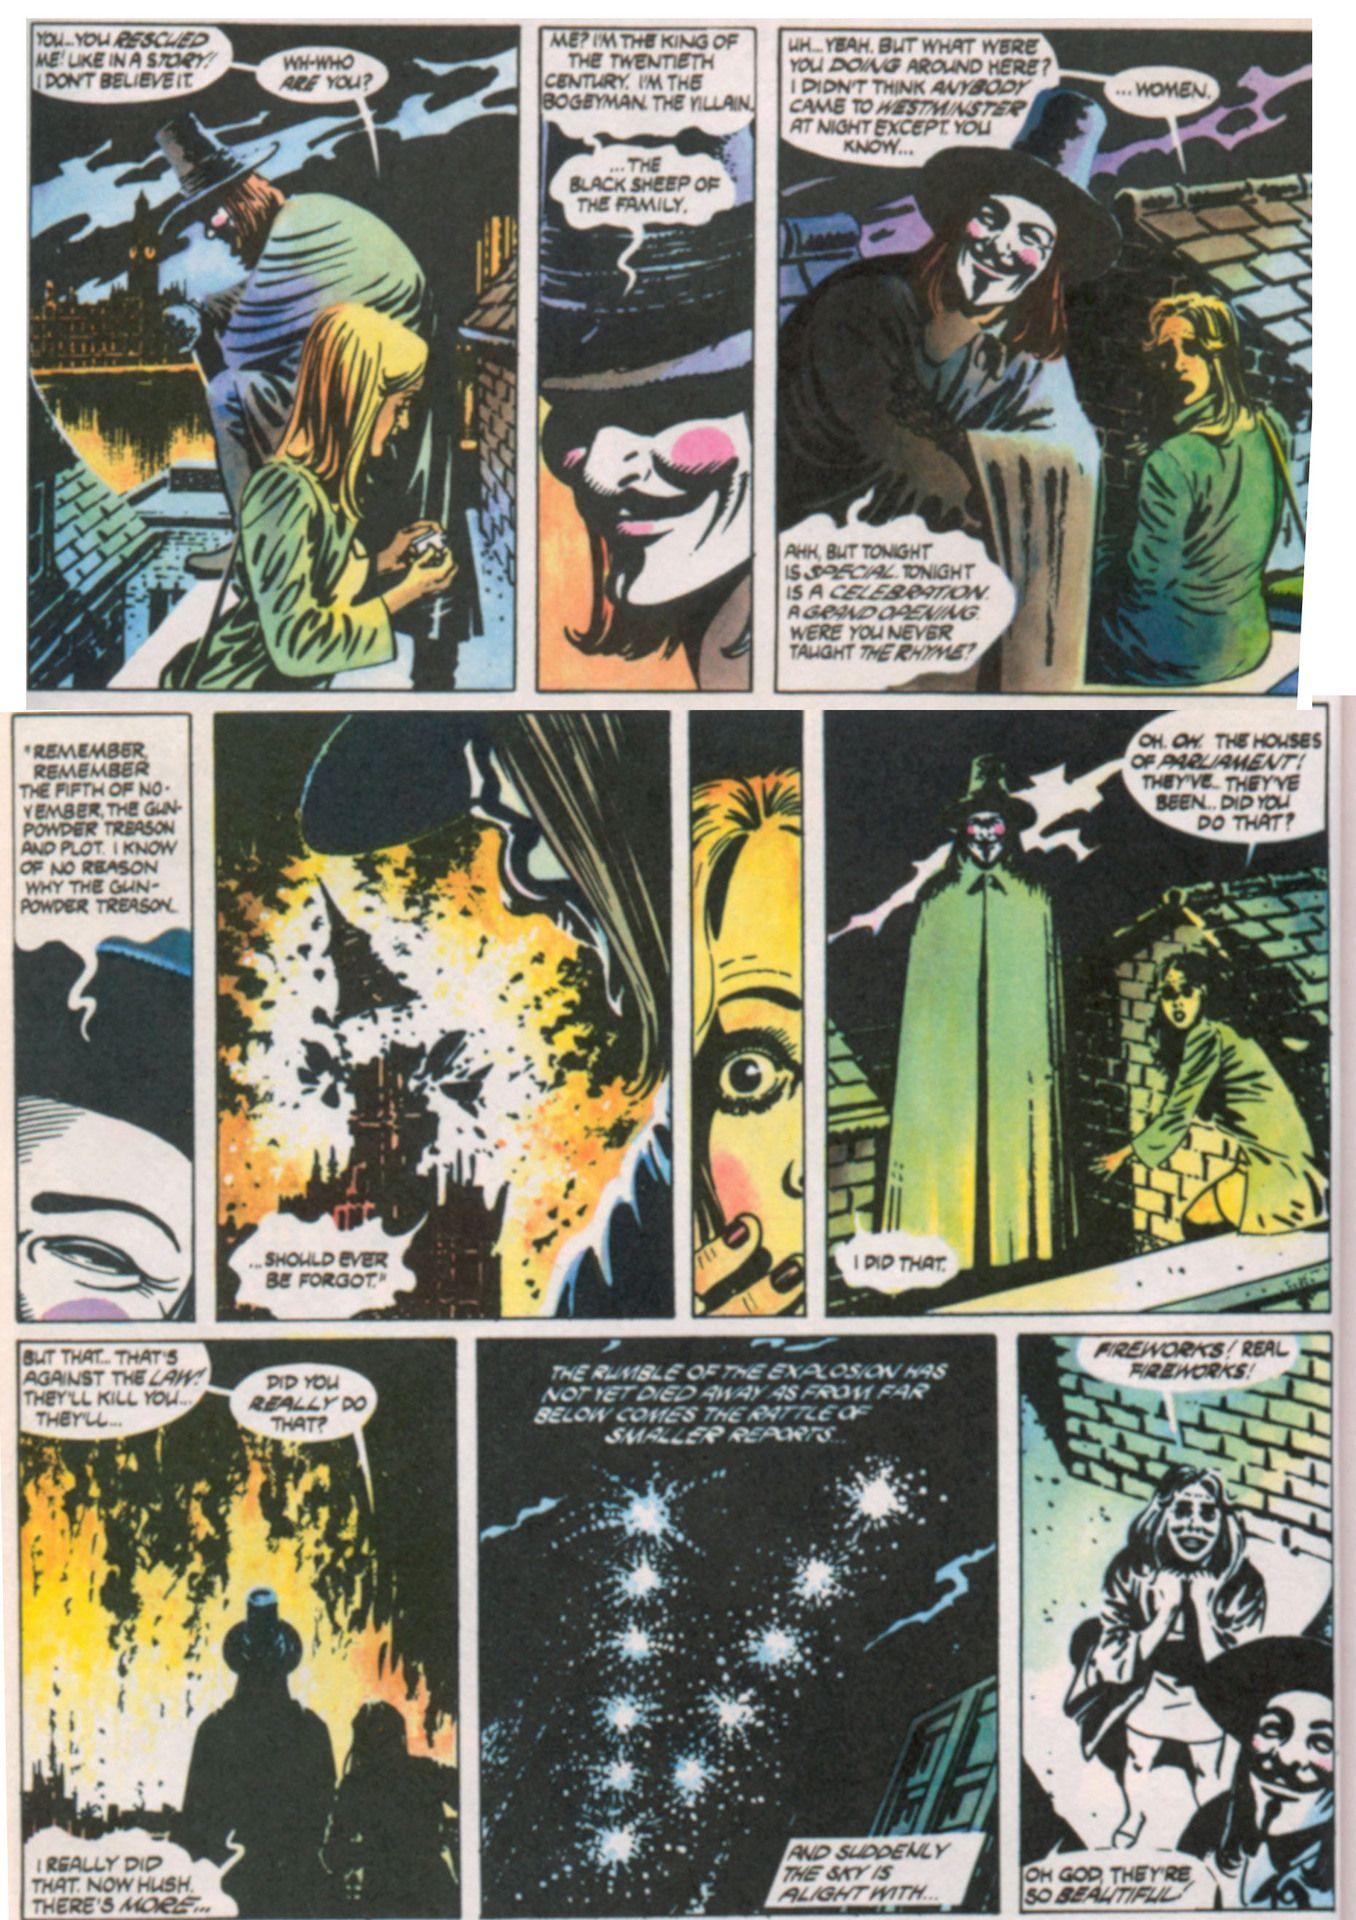 Pin By Hannah Rowell On Ideas Are Bulletproof Graphic Novel V For Vendetta Comic V For Vendetta